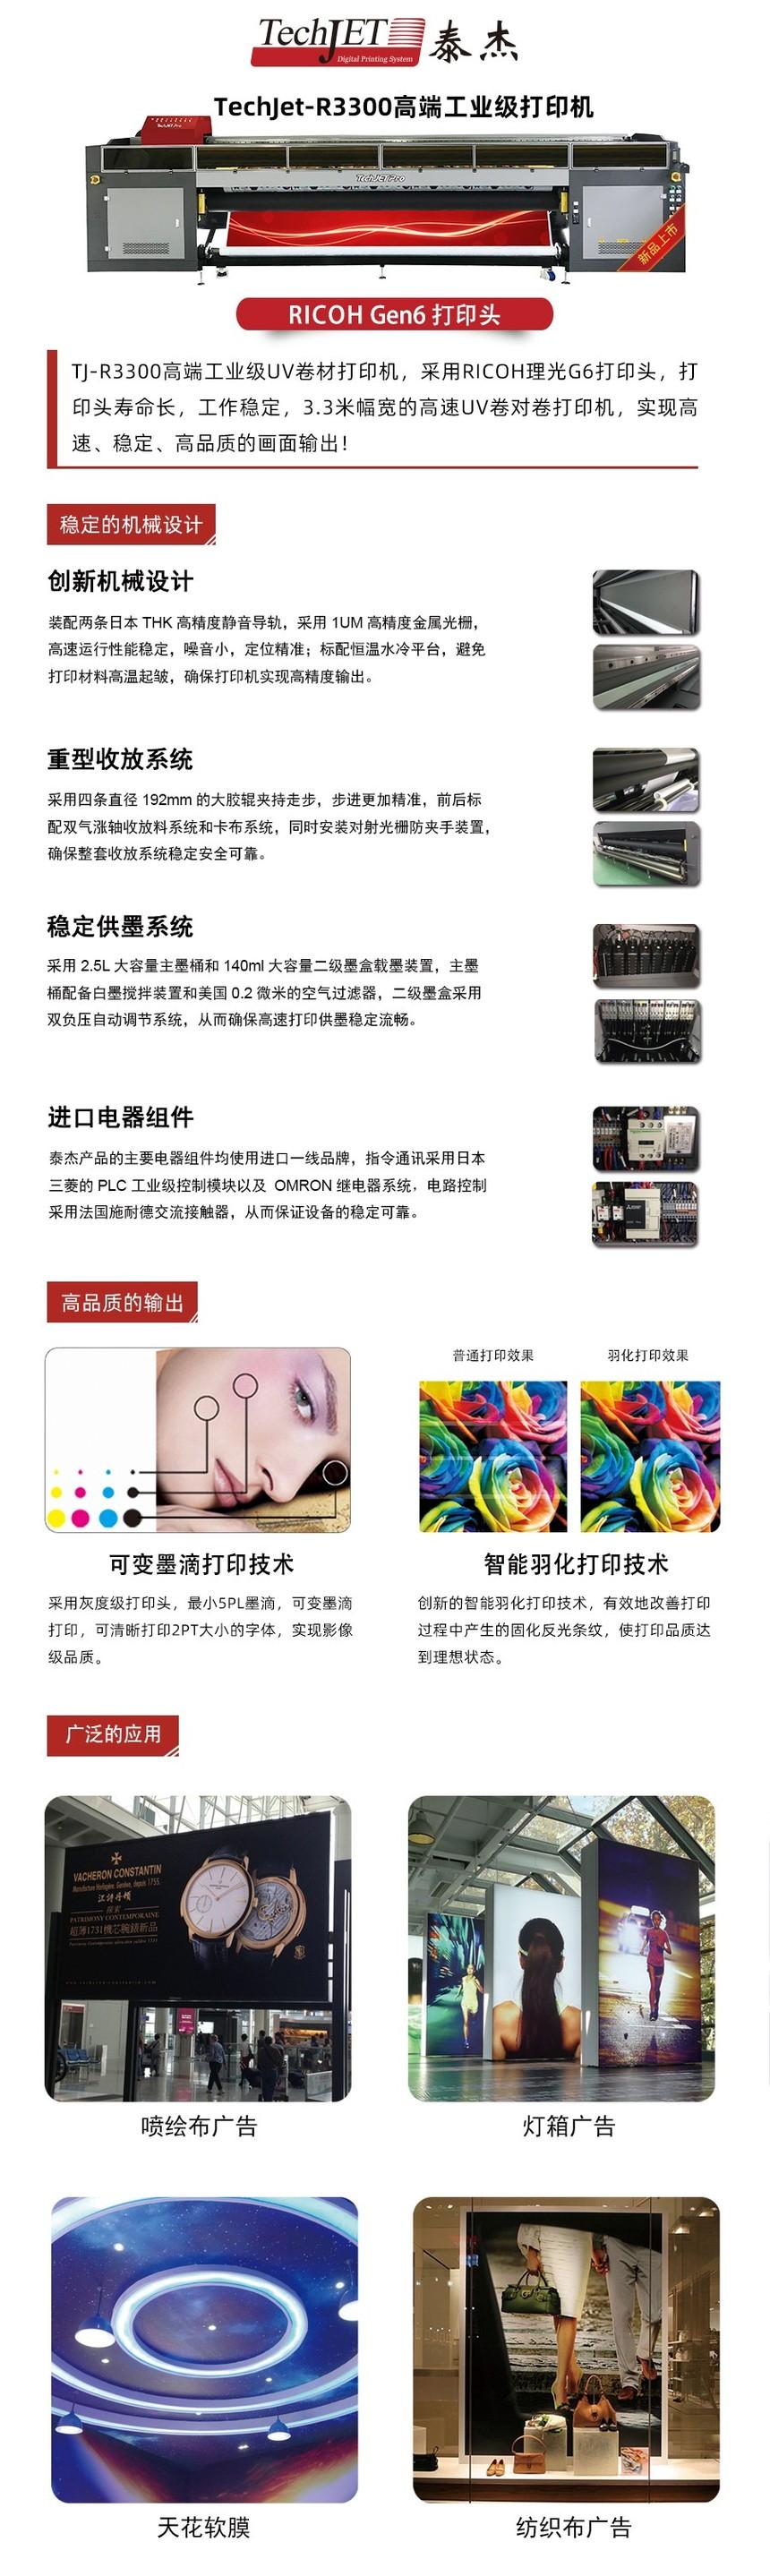 TJ-R3300中文.jpg